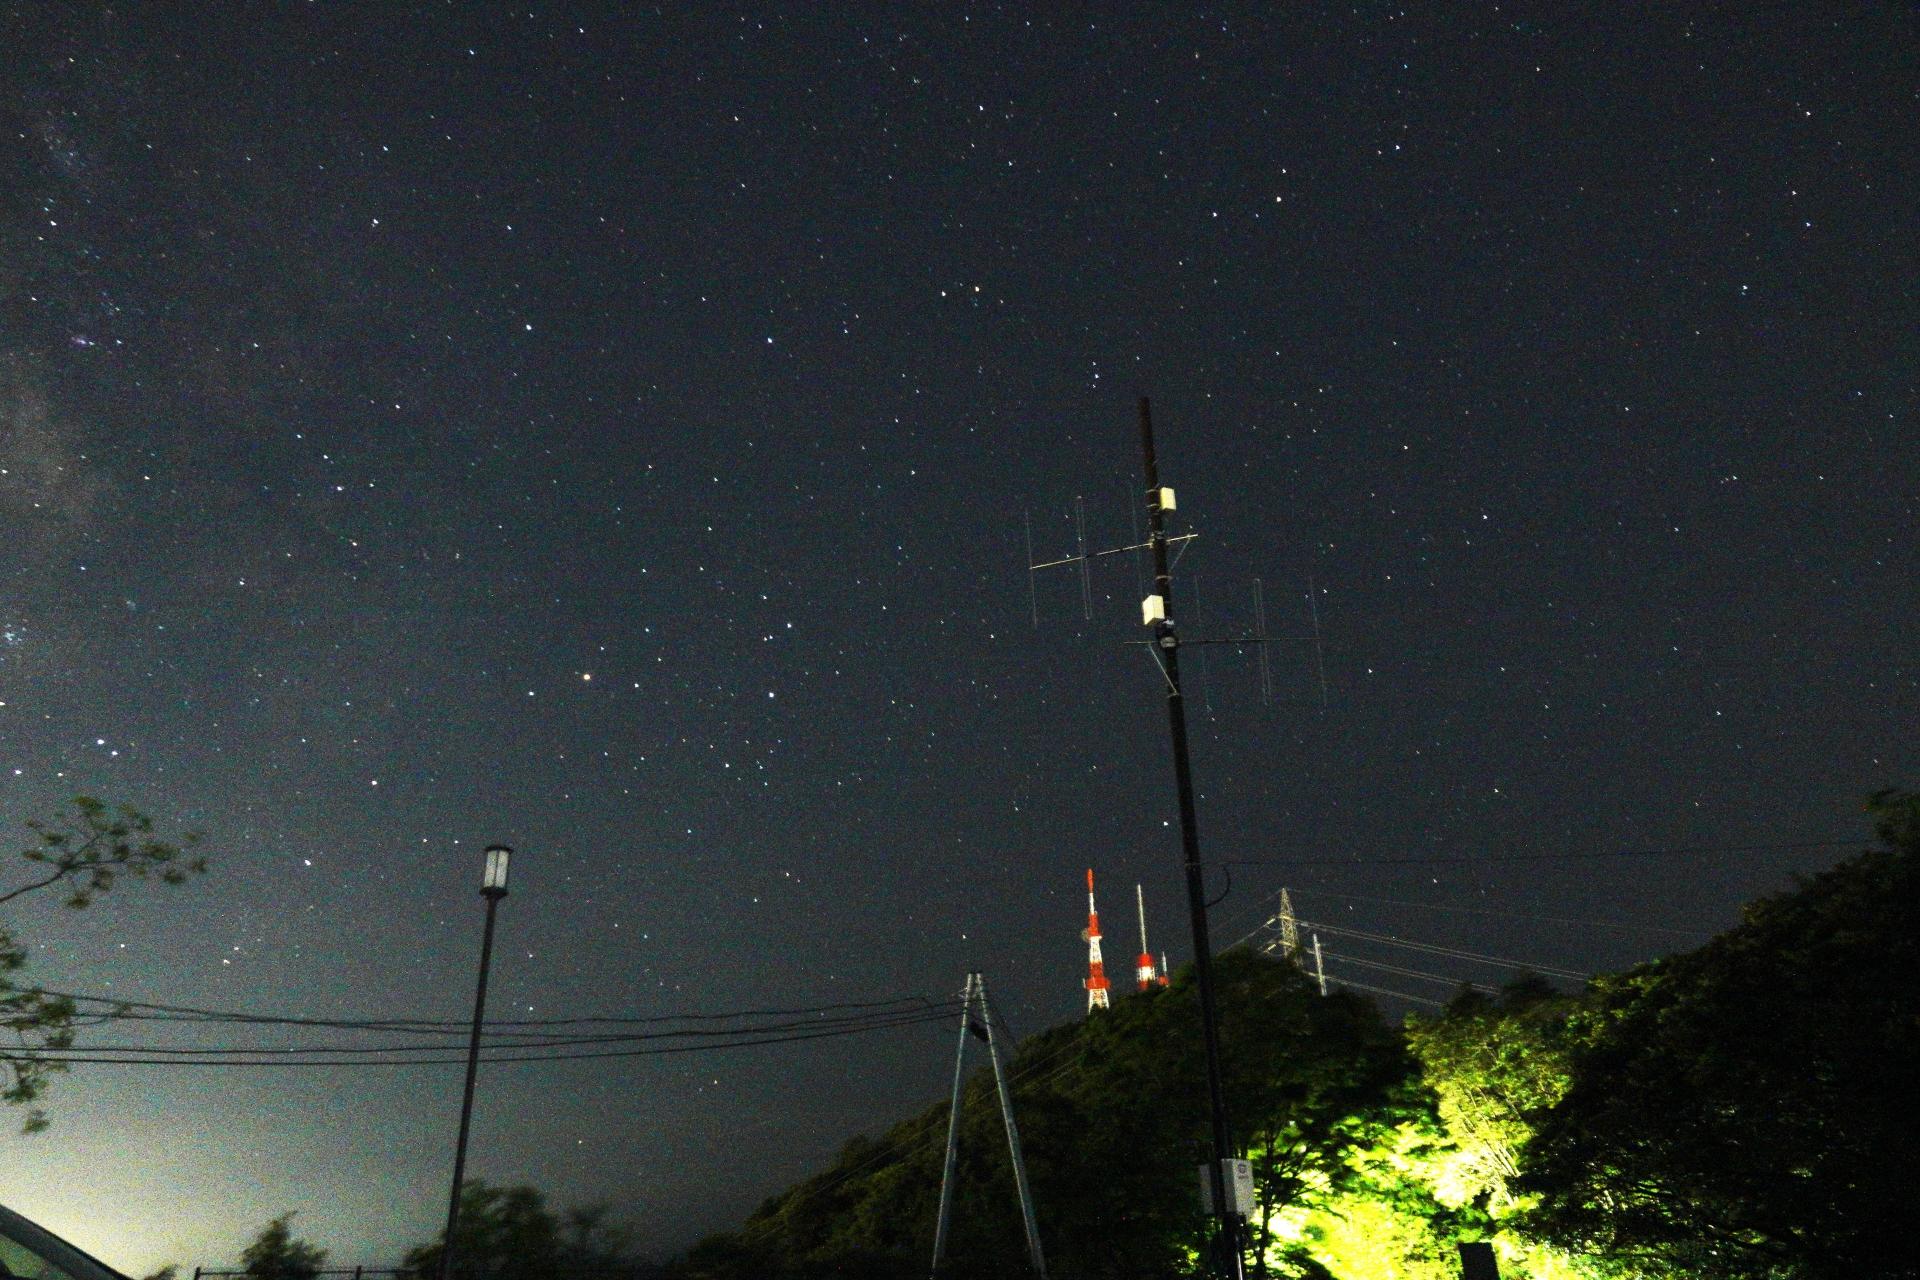 愛宕山展望台の駐車場